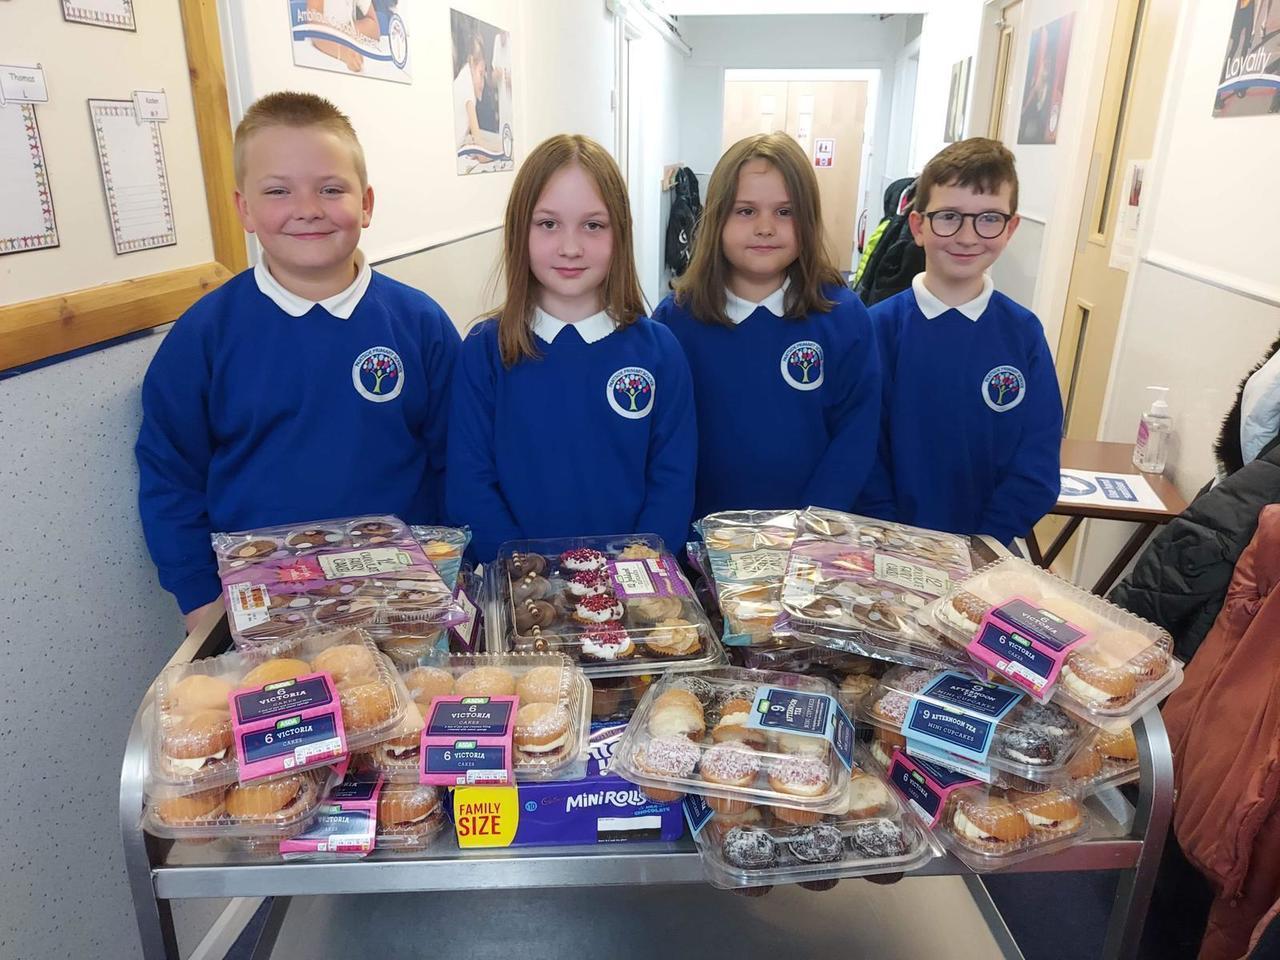 School donation | Asda Blackwood